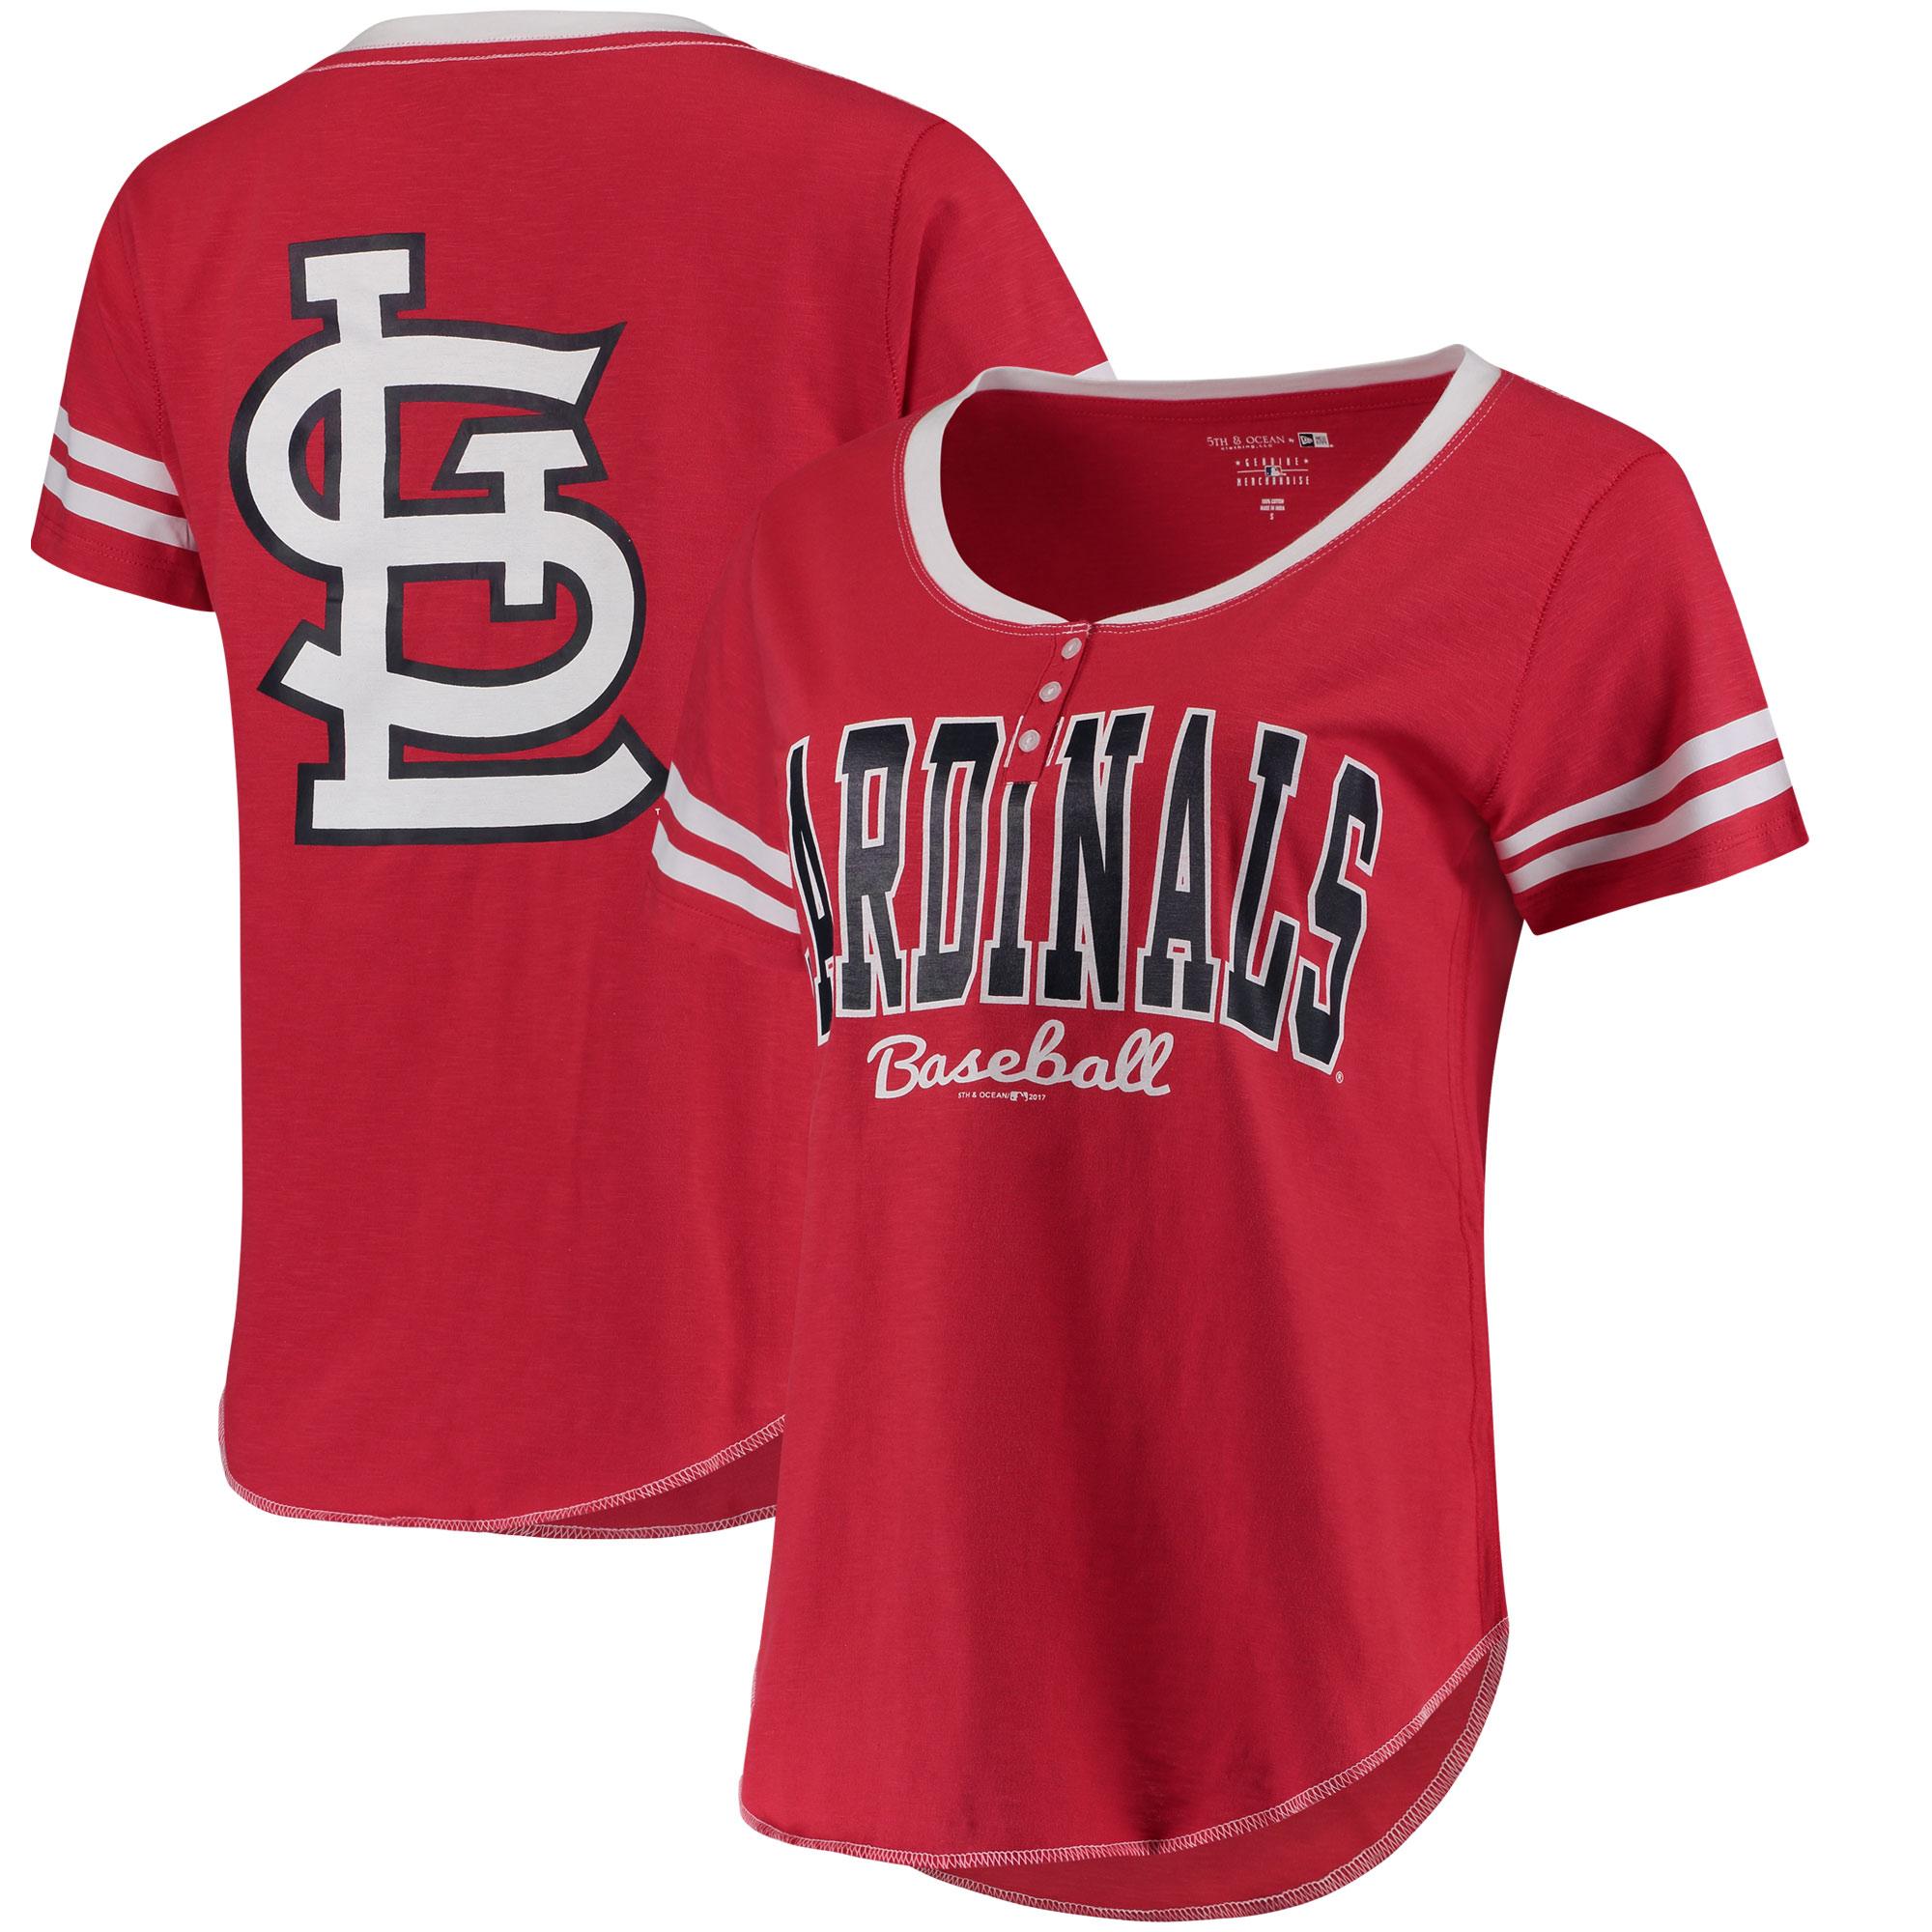 St. Louis Cardinals 5th & Ocean by New Era Women's Slub Henley T-Shirt - Red/White